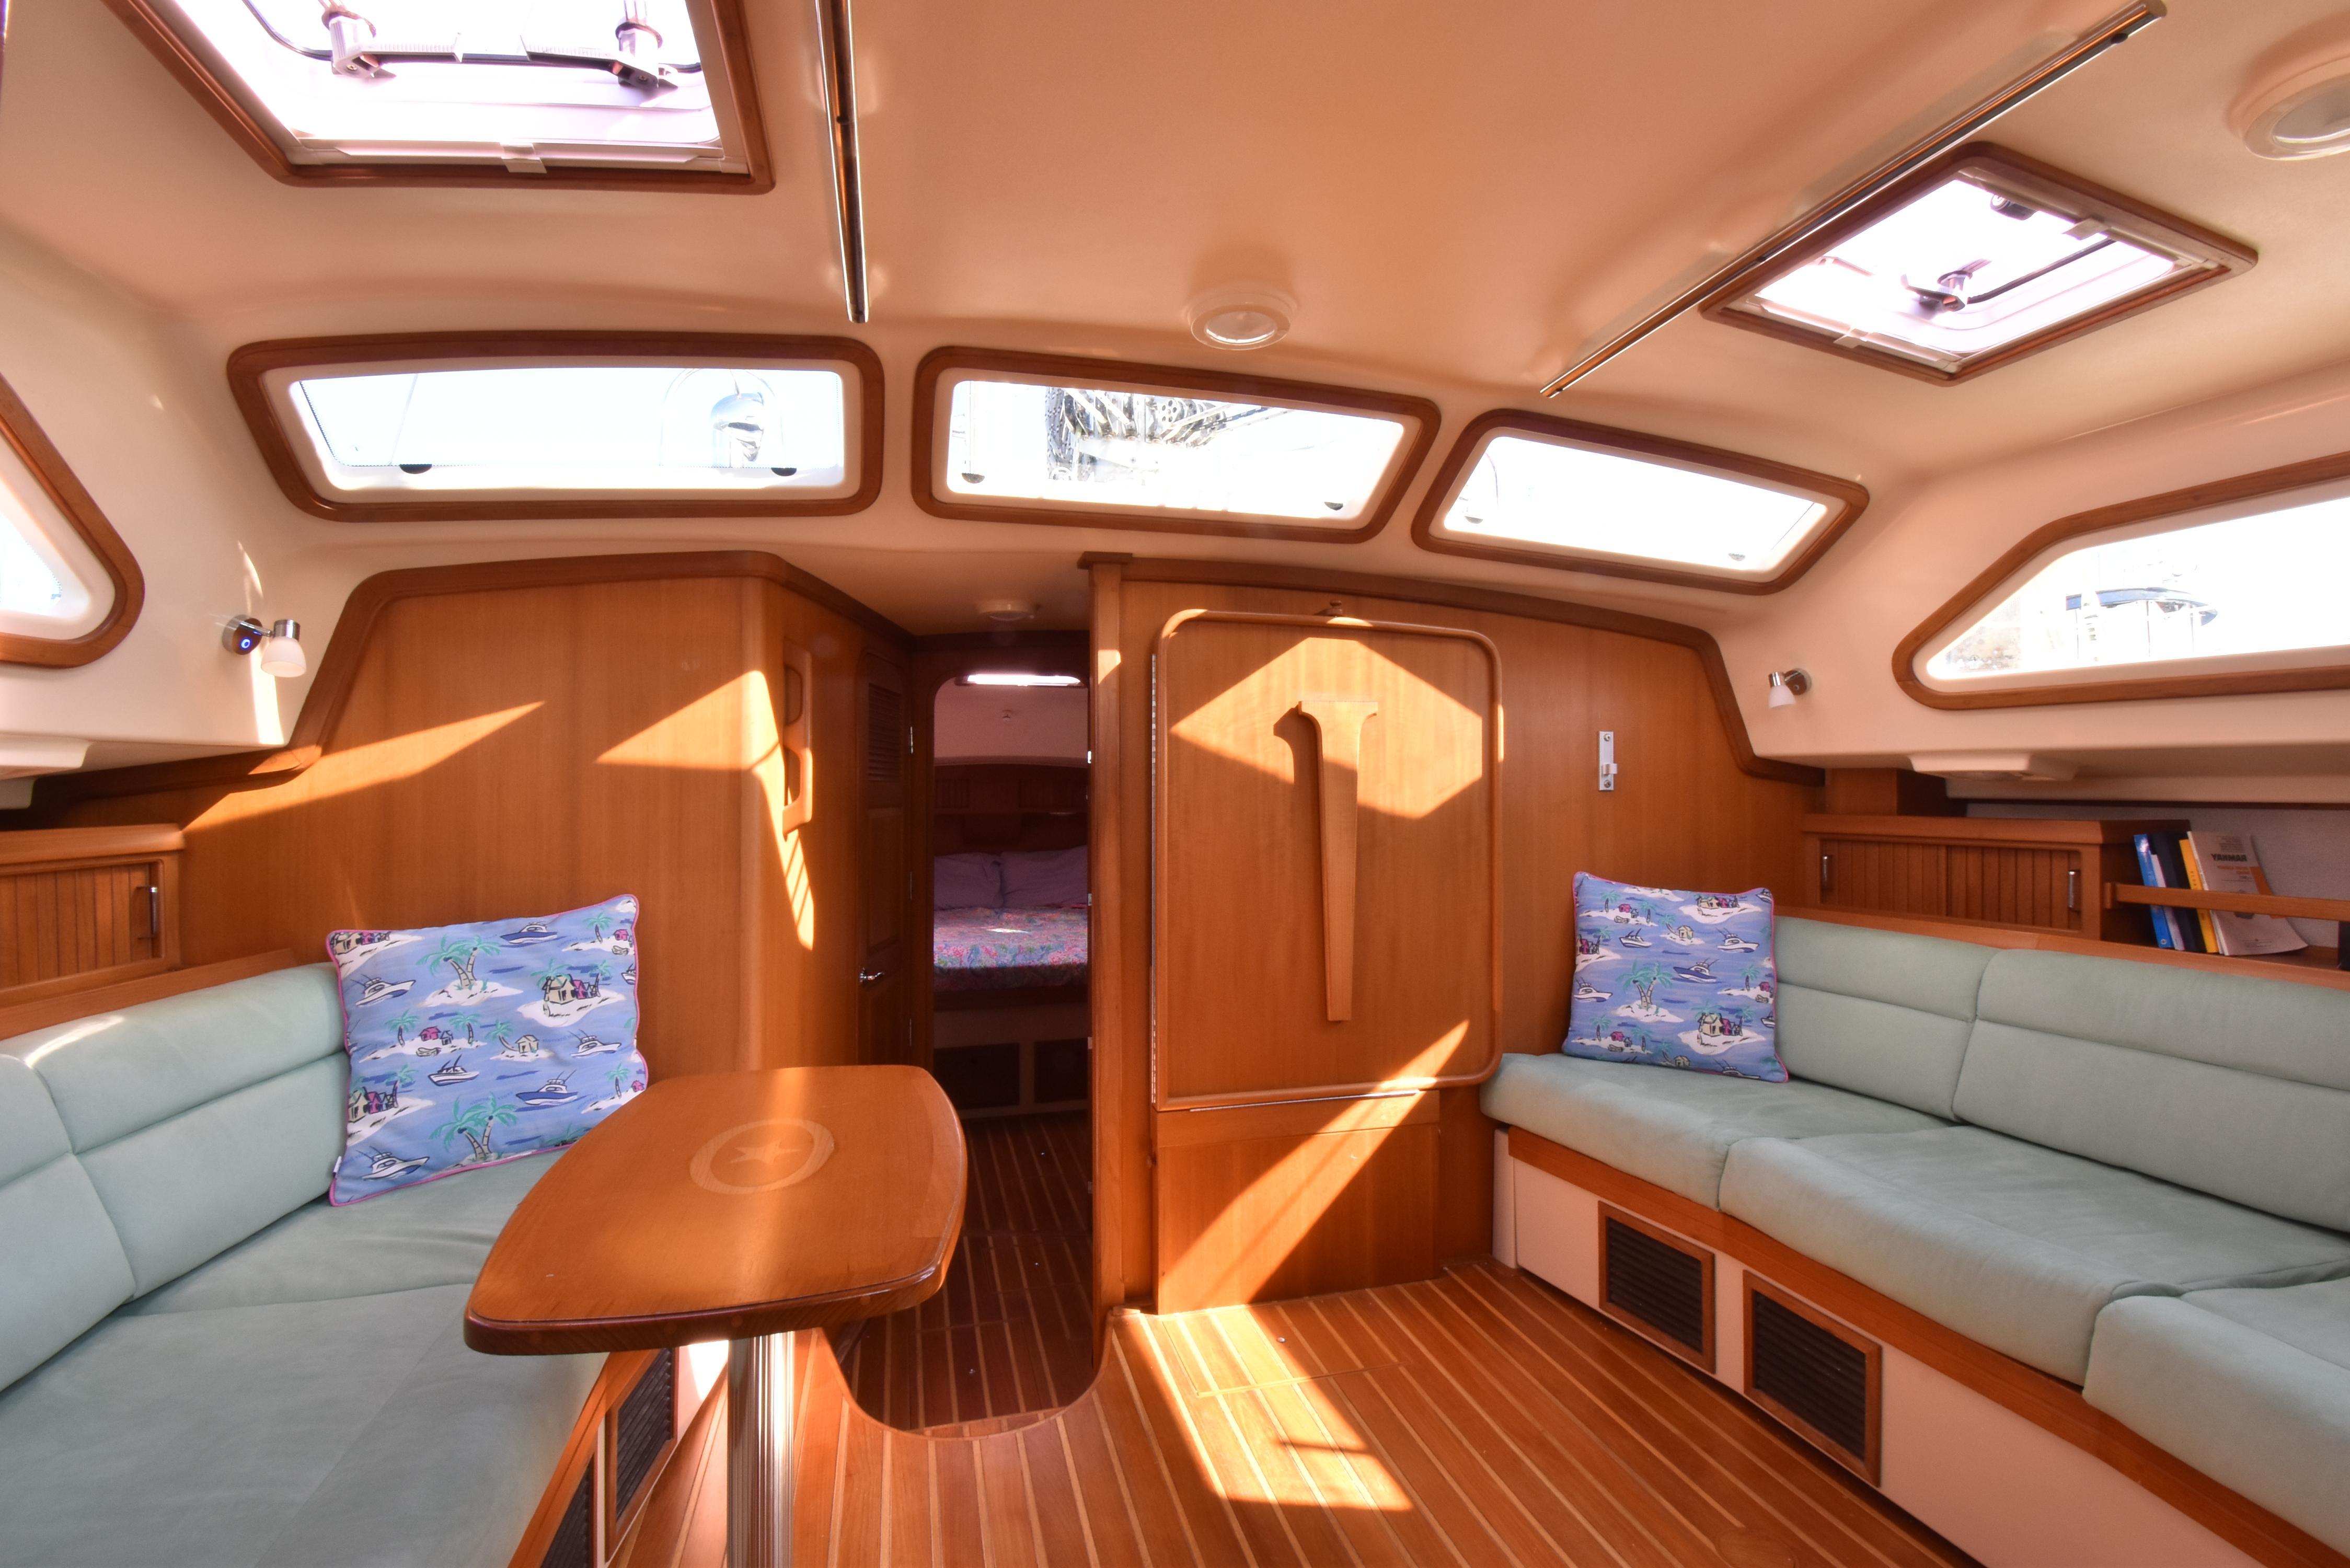 new UltraSuede interior